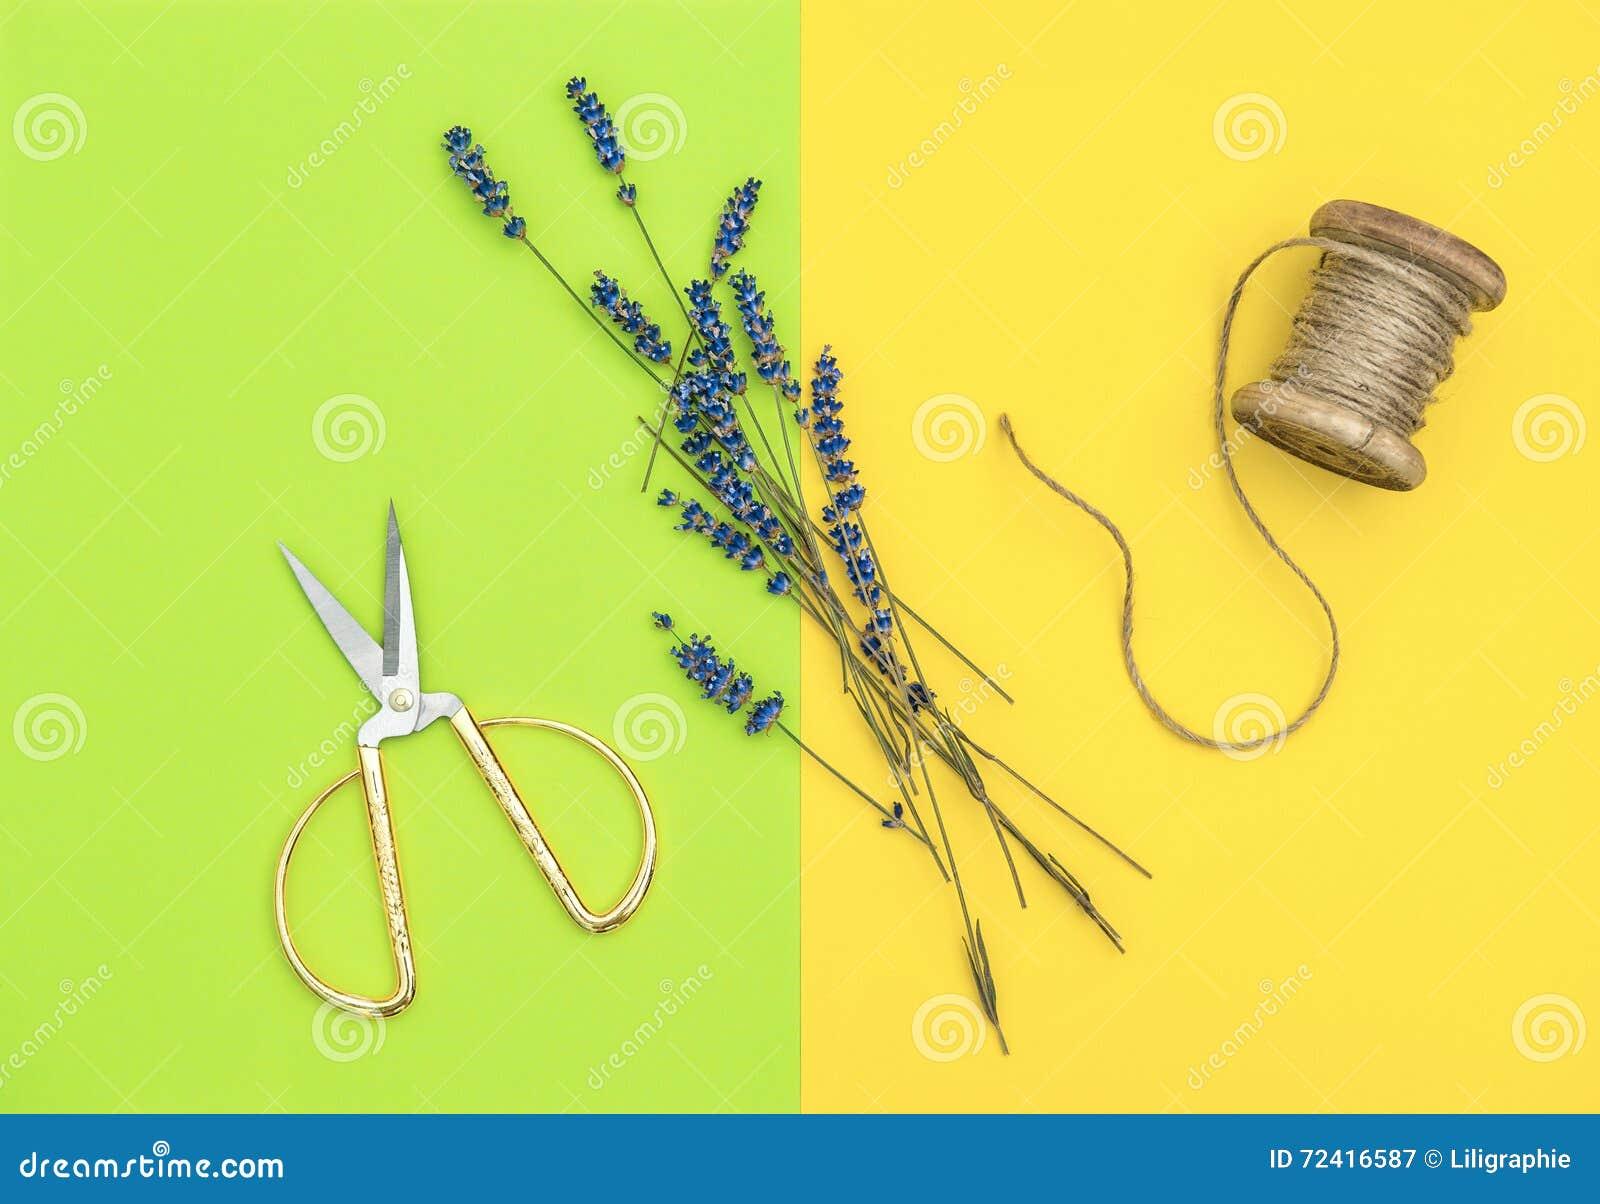 Lavender Flowers And Vintage Scissors Minimal Flat Lay ...